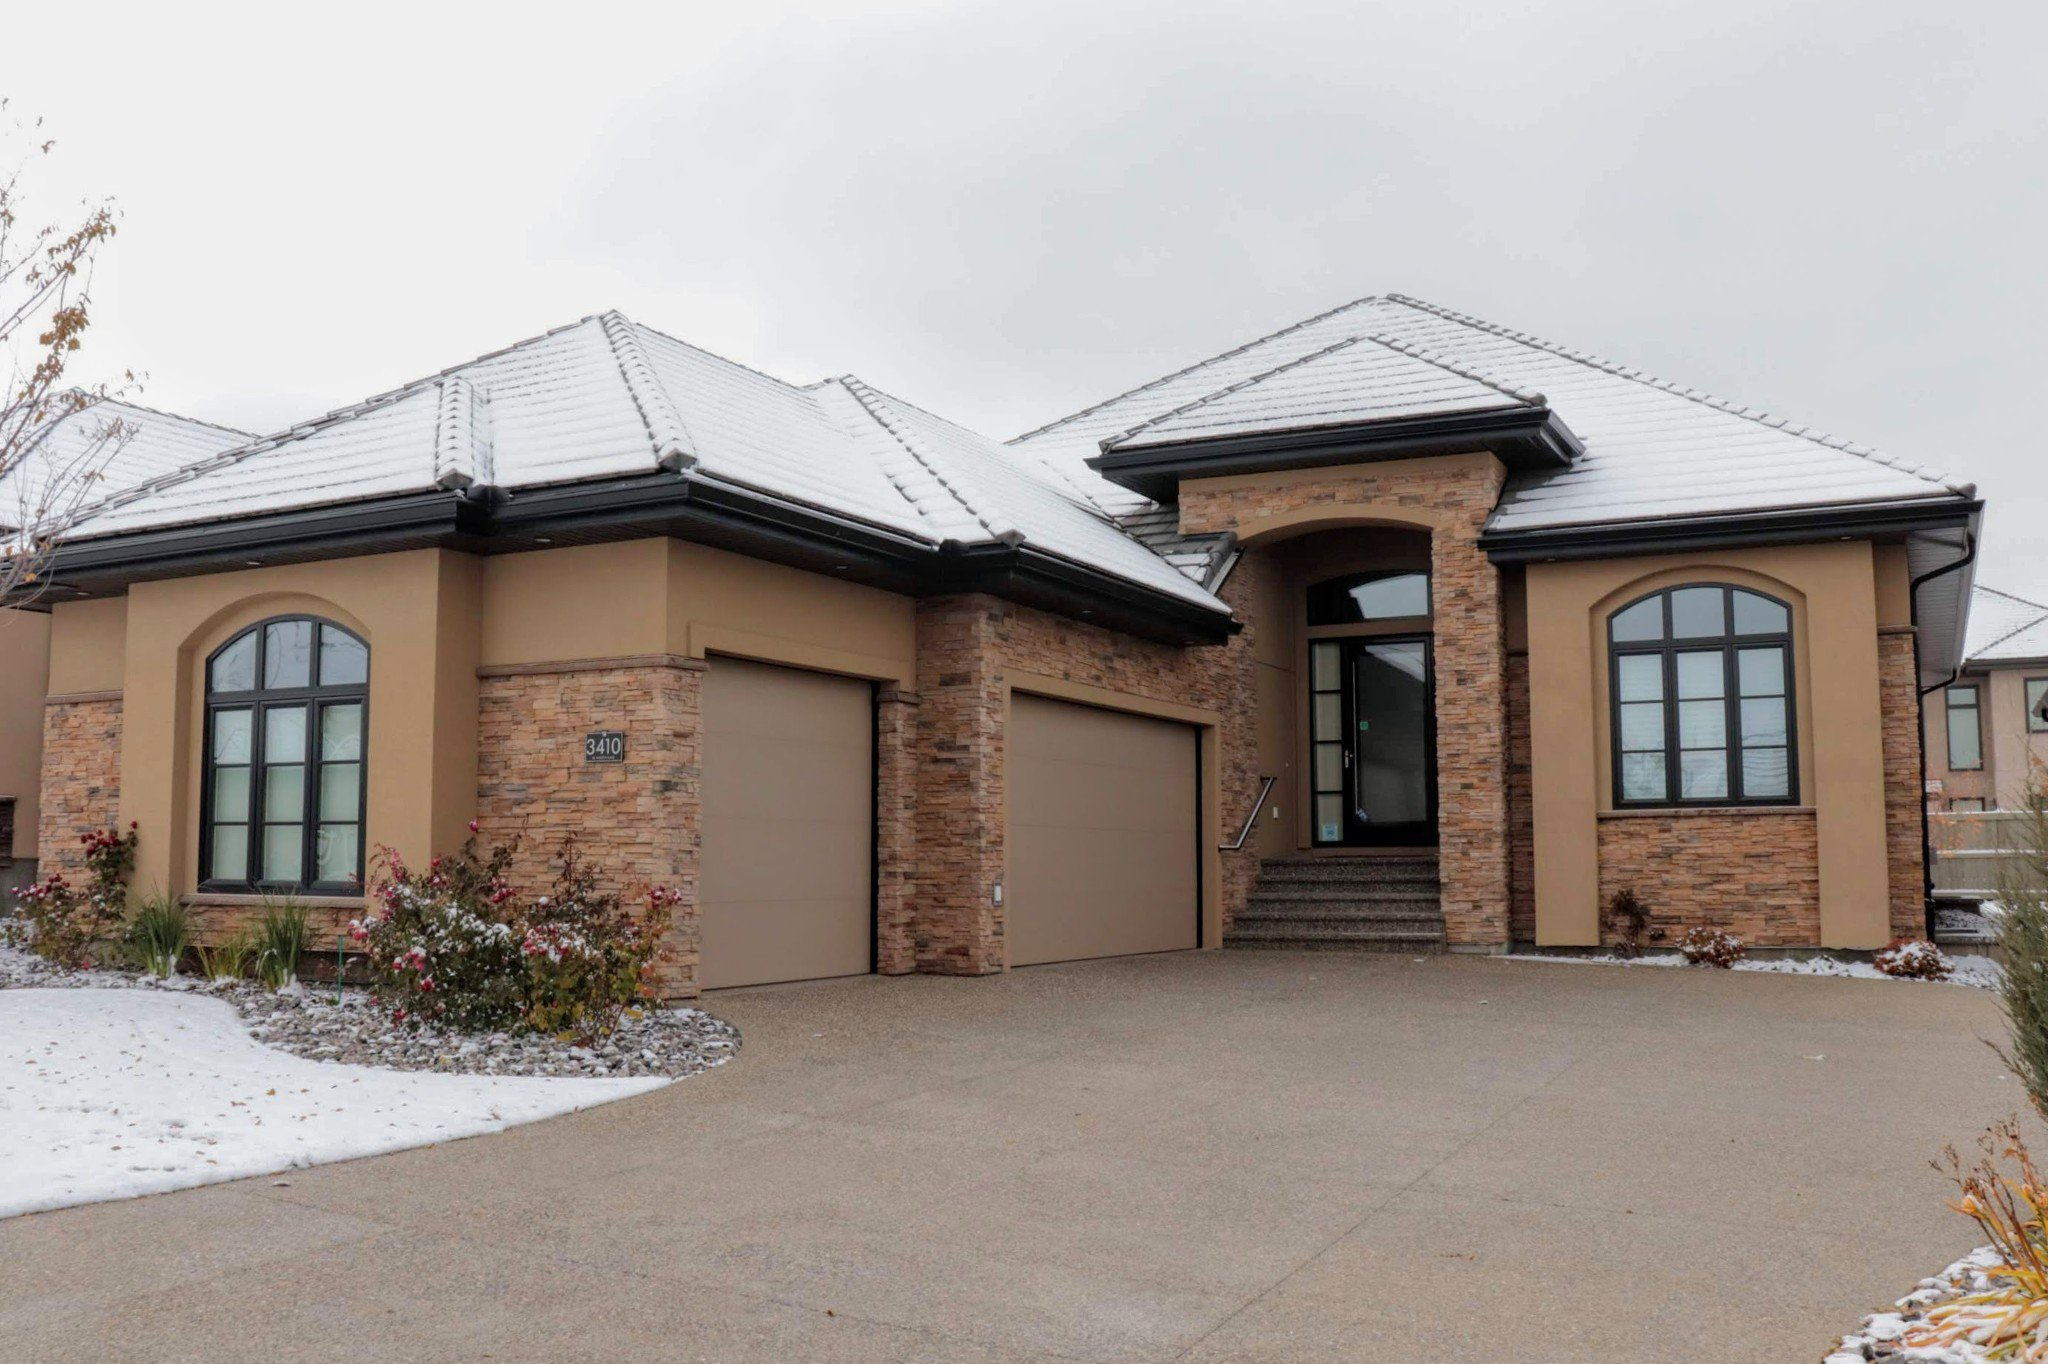 Main Photo: 3410 Watson Place SW in Edmonton: Windermere House Half Duplex for sale : MLS®# E4124264